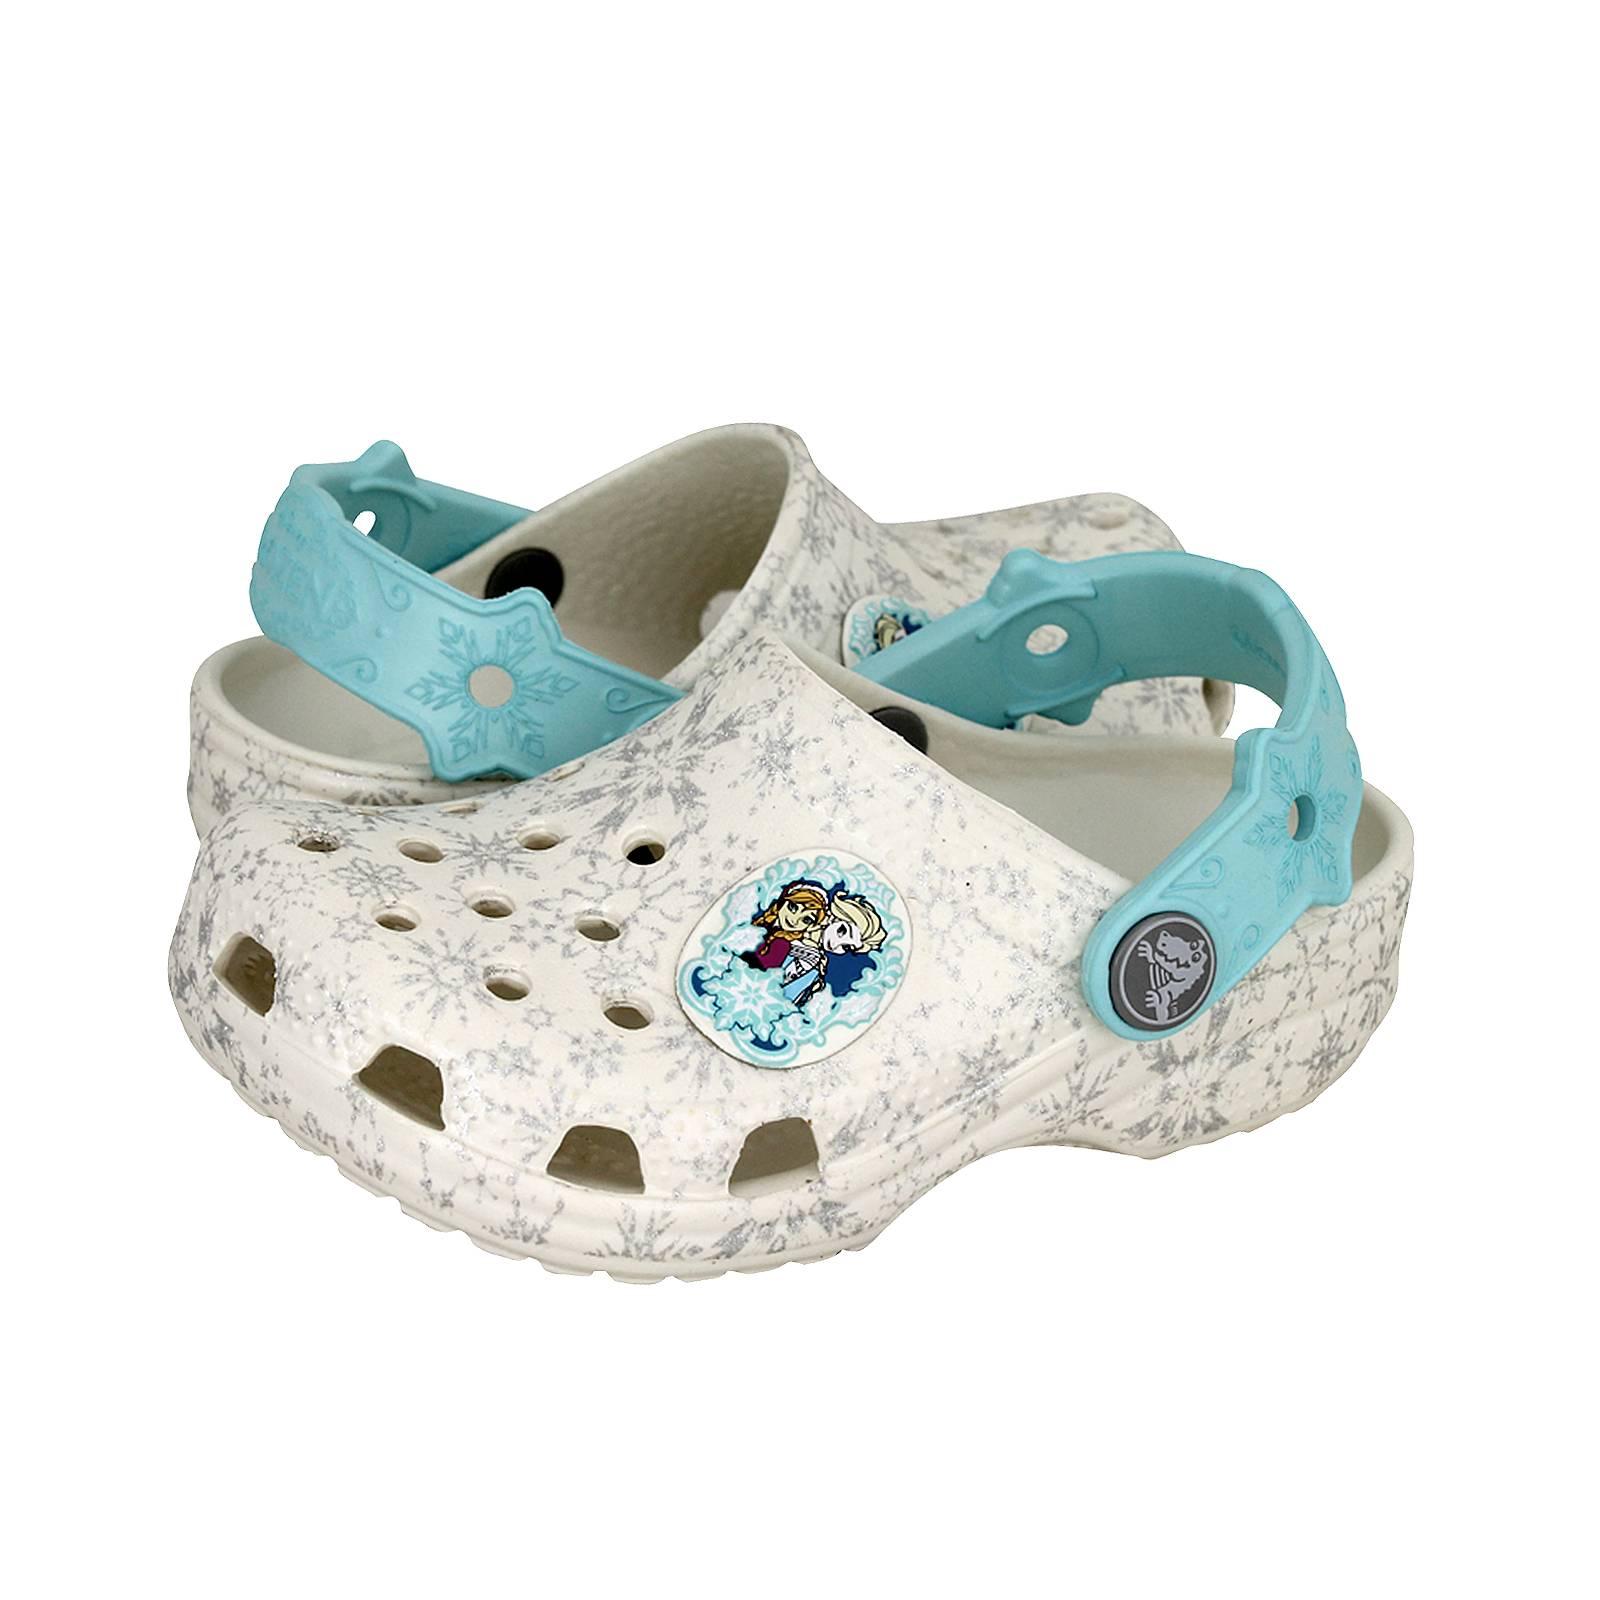 Classic Frozen Clog - Crocs Kids' clogs